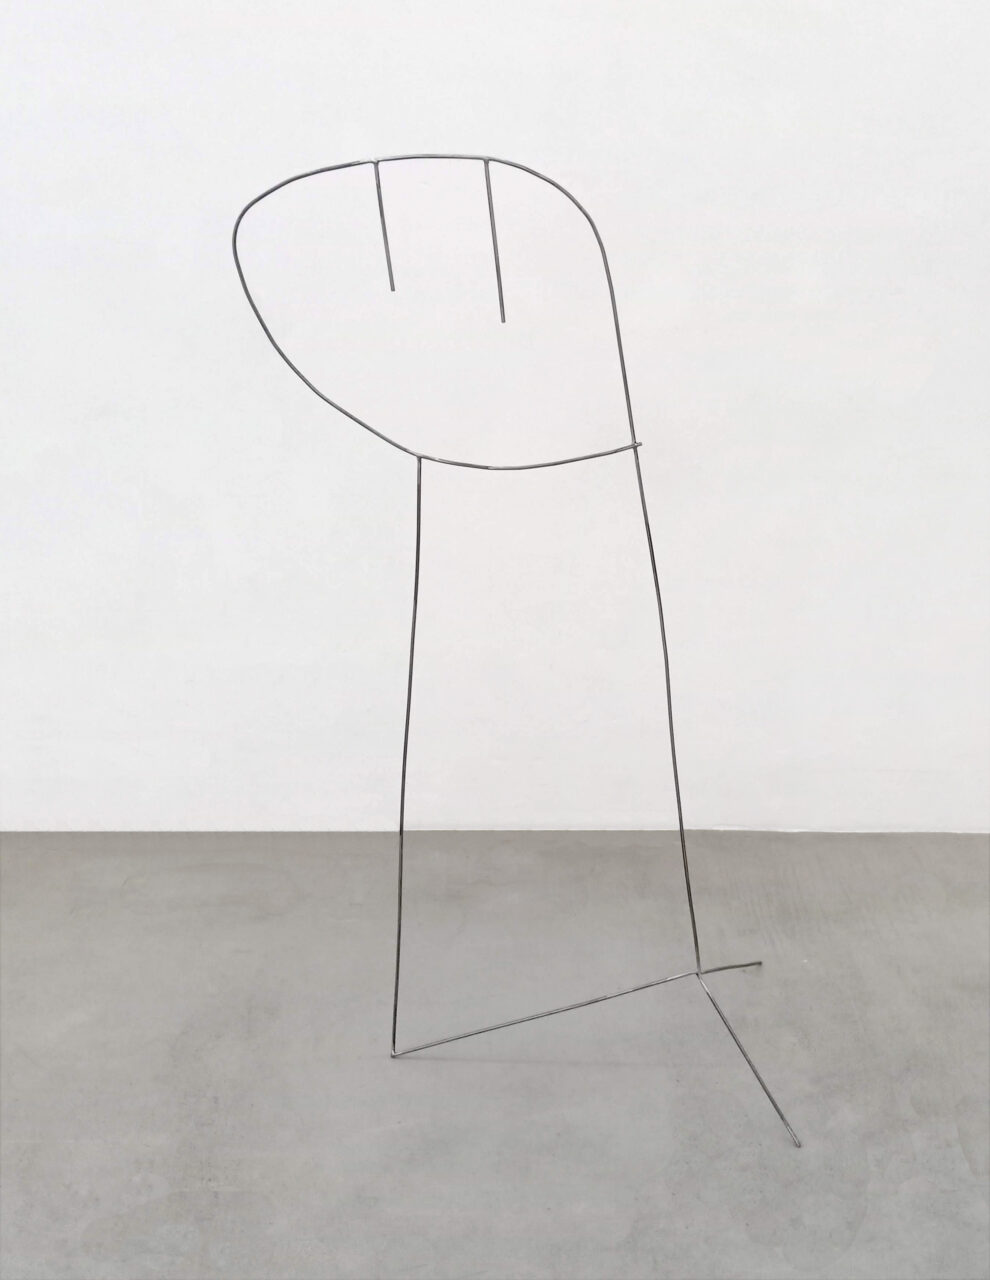 """Philip Guston"" / Le Squad, 2019, steel, 154, 60 x 56 cm"